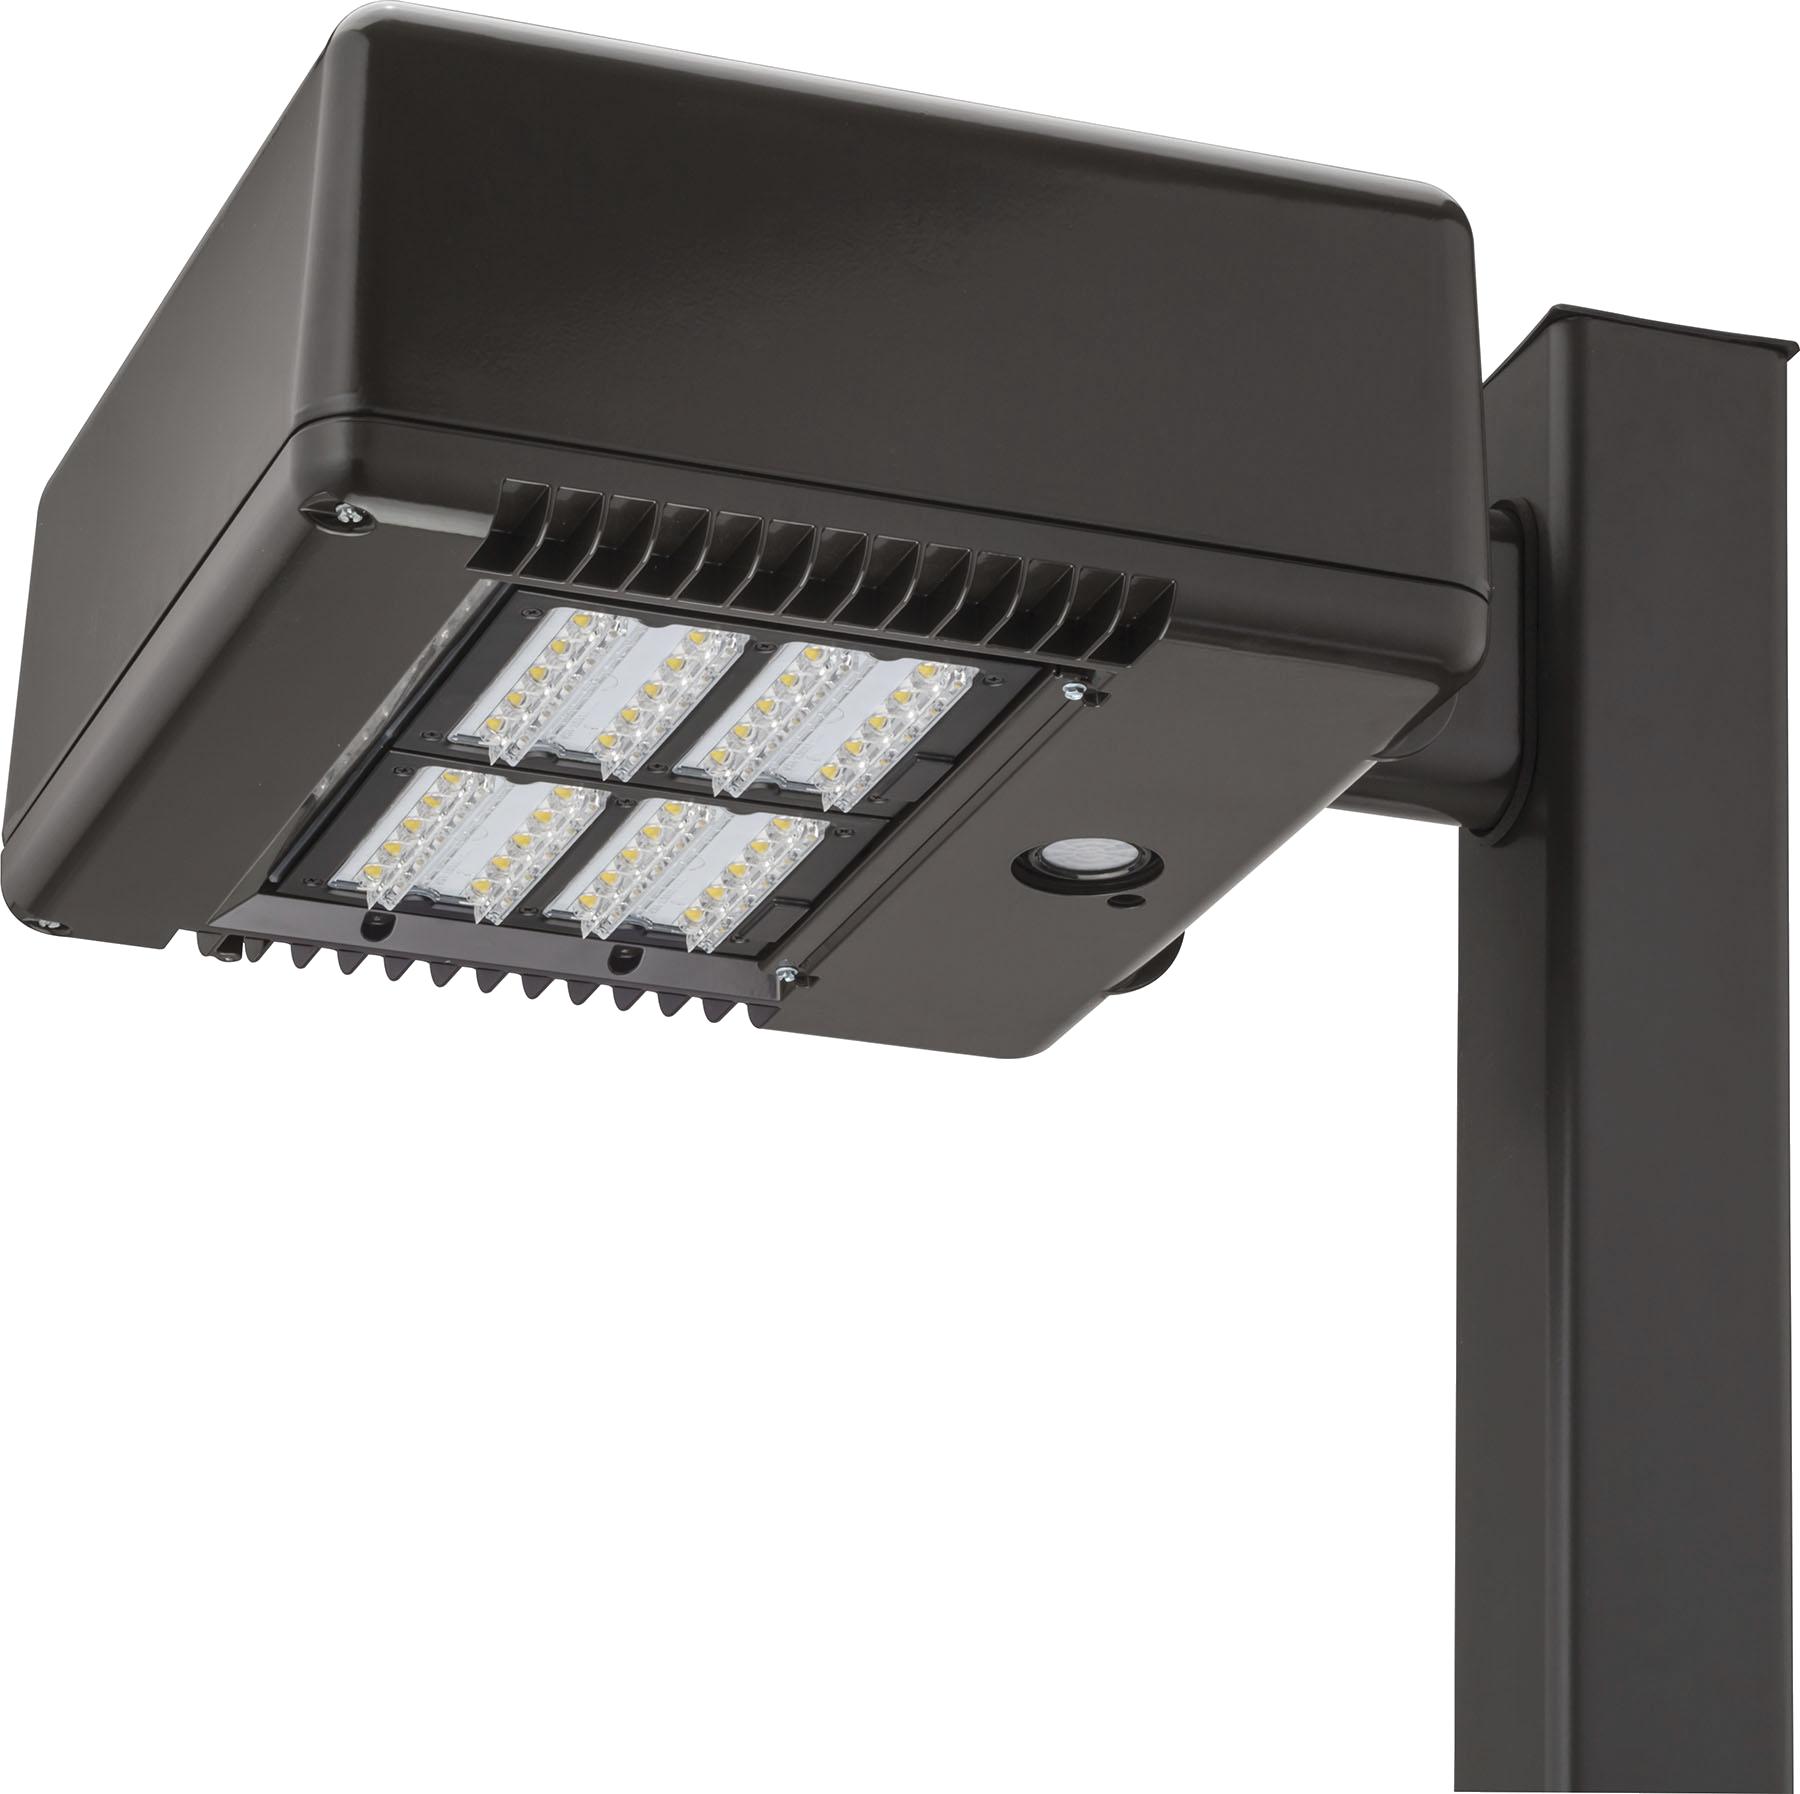 KAD LED with Motion Sensor